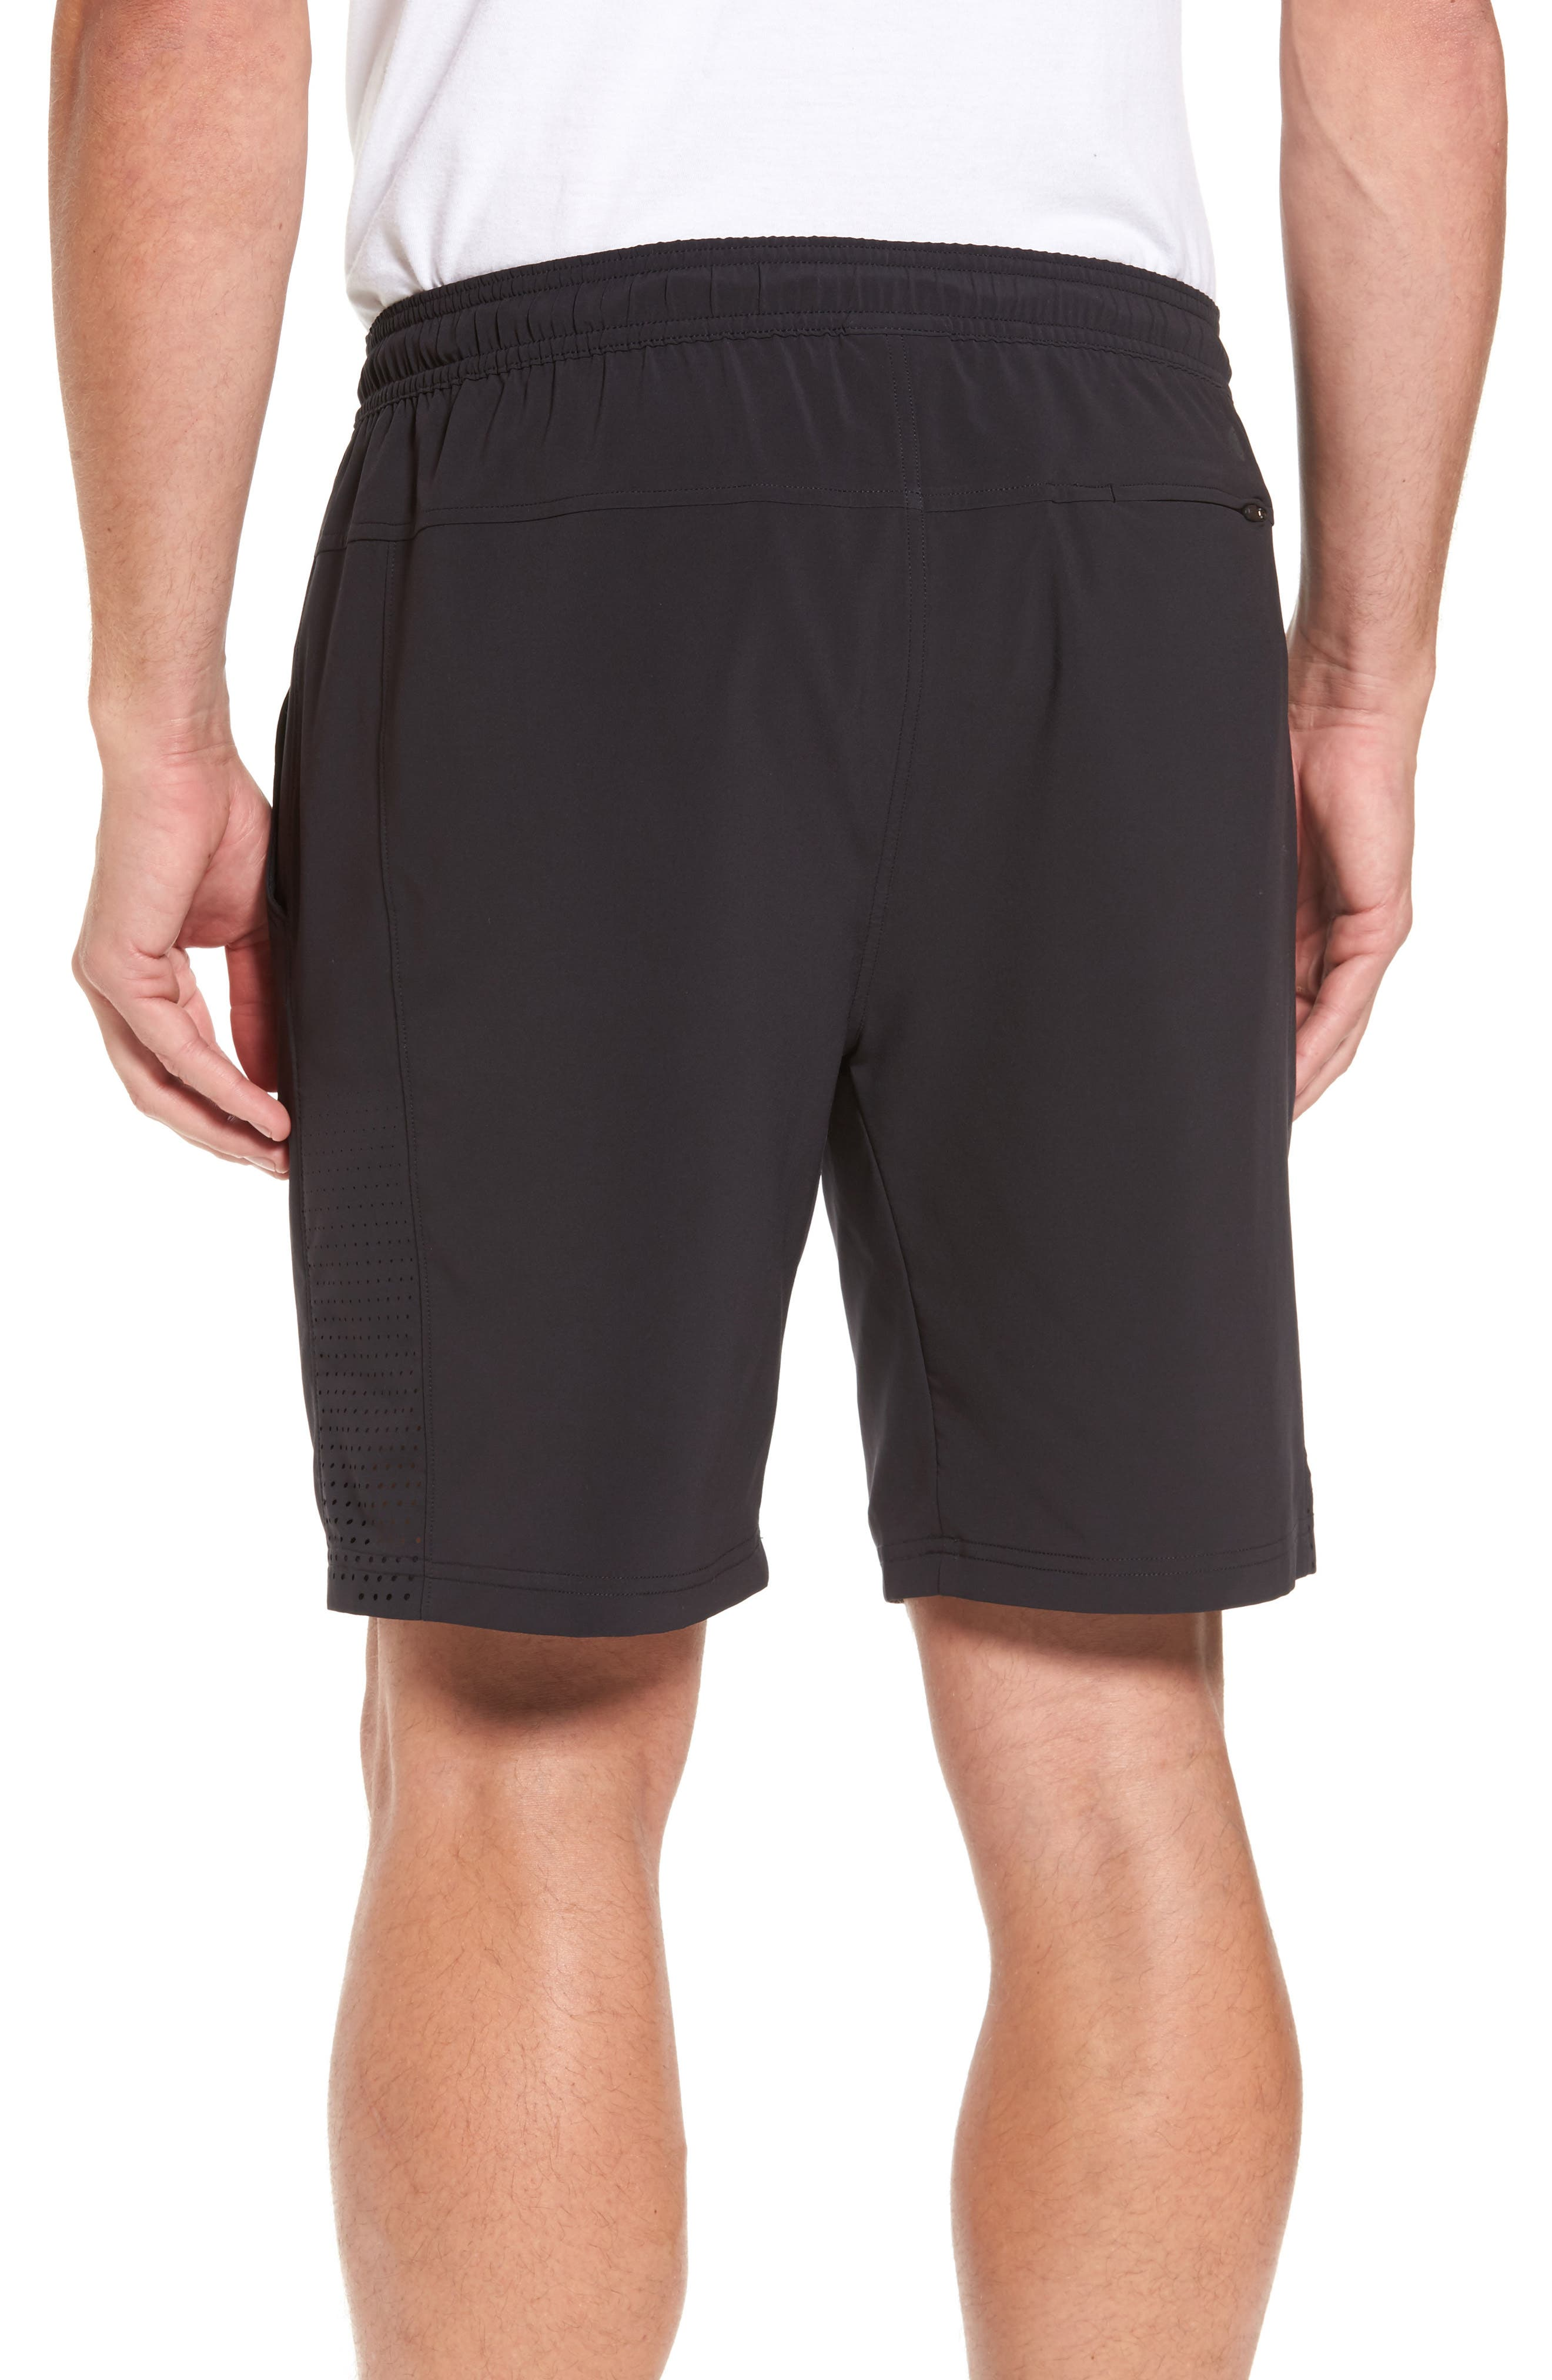 Graphite Core Athletic Shorts,                             Alternate thumbnail 2, color,                             BLACK